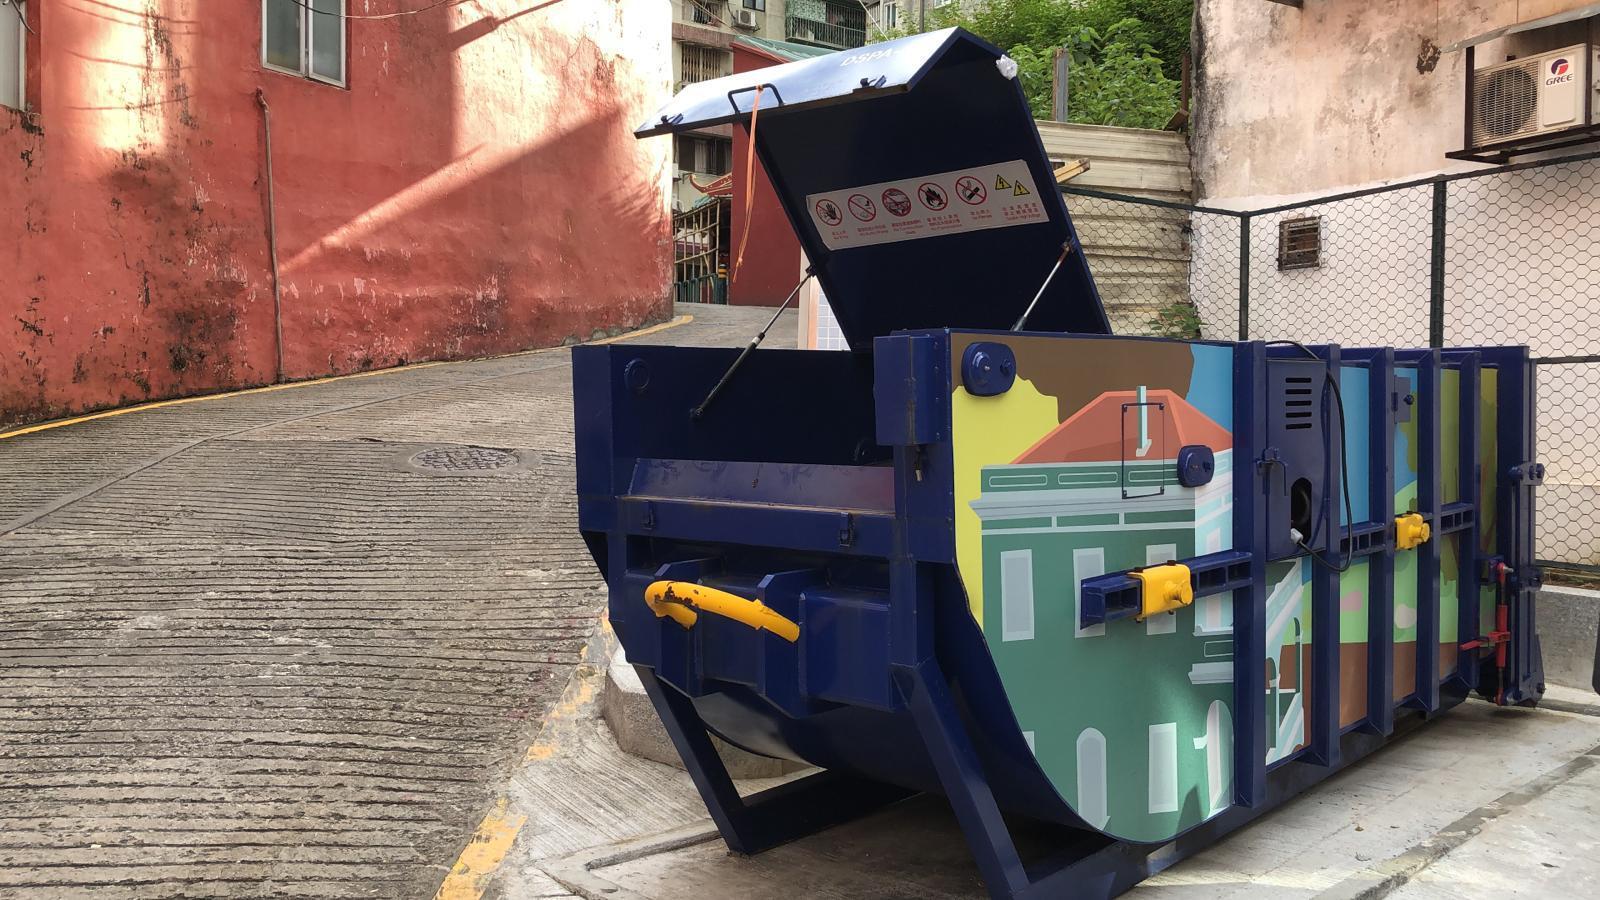 M73 Compacting trash bin at Travessa de Sancho Pança